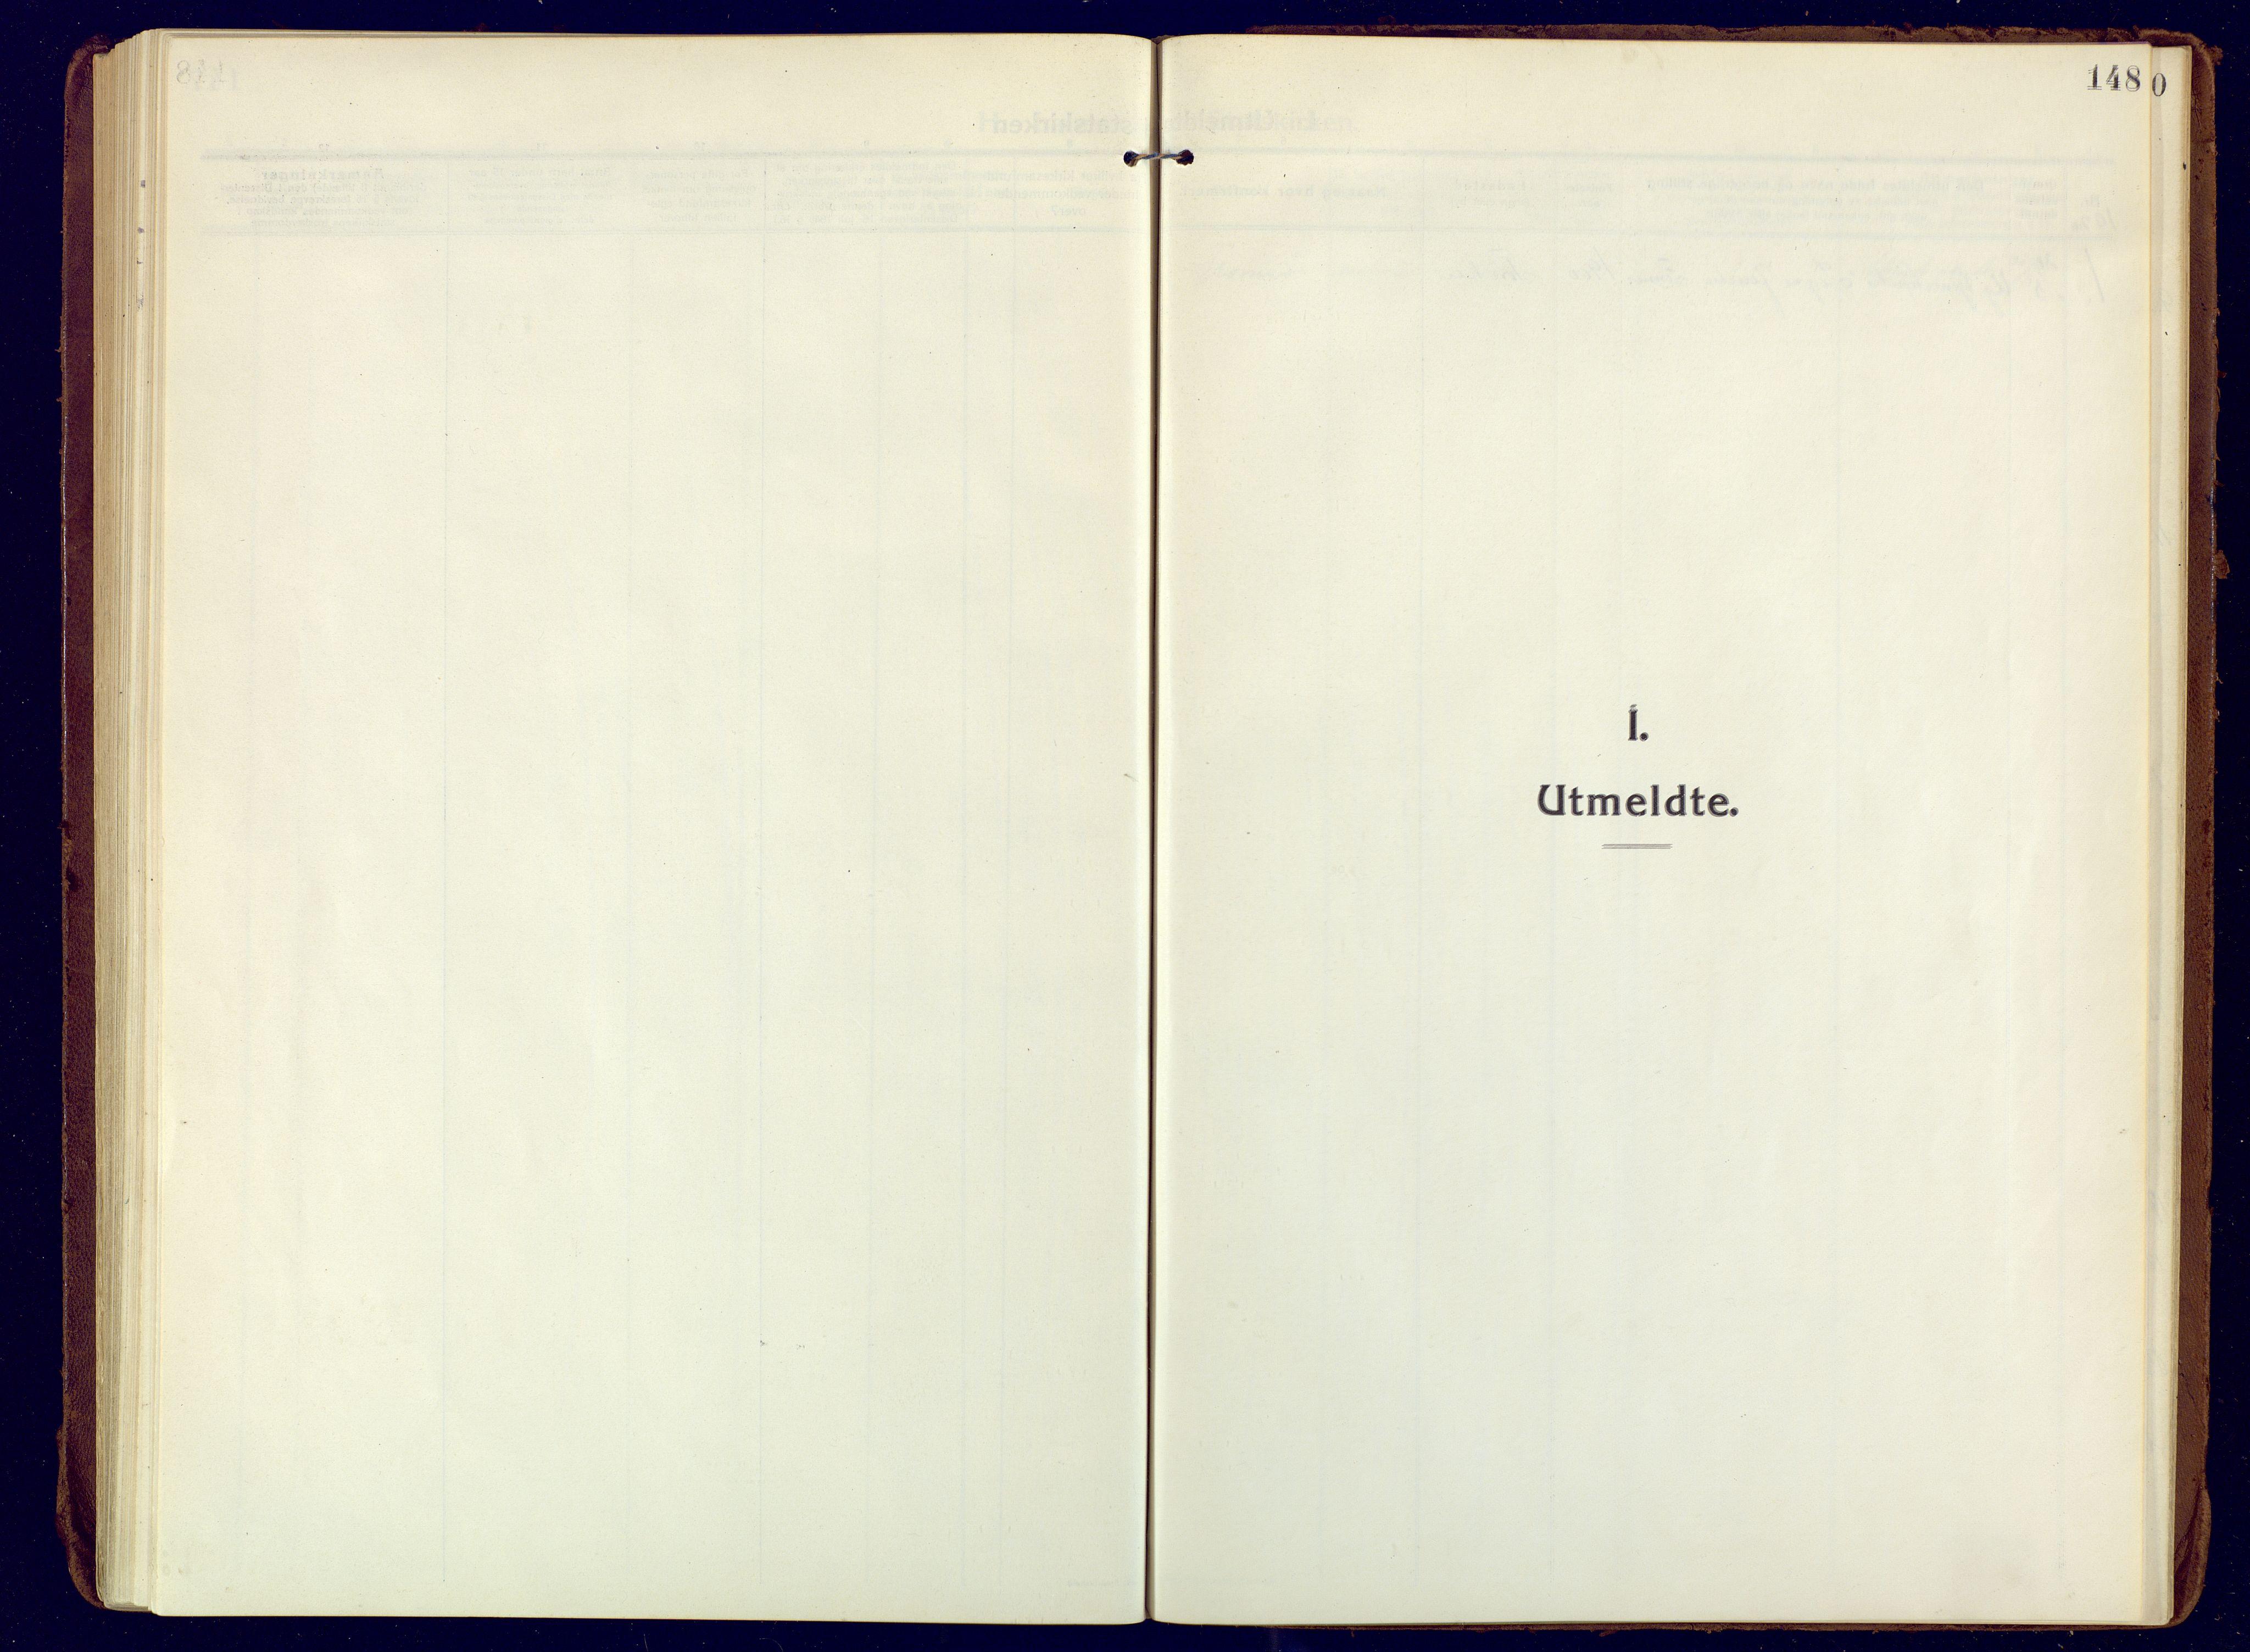 SATØ, Mefjord/Berg sokneprestkontor, G/Ga/Gaa: Ministerialbok nr. 10, 1916-1928, s. 148